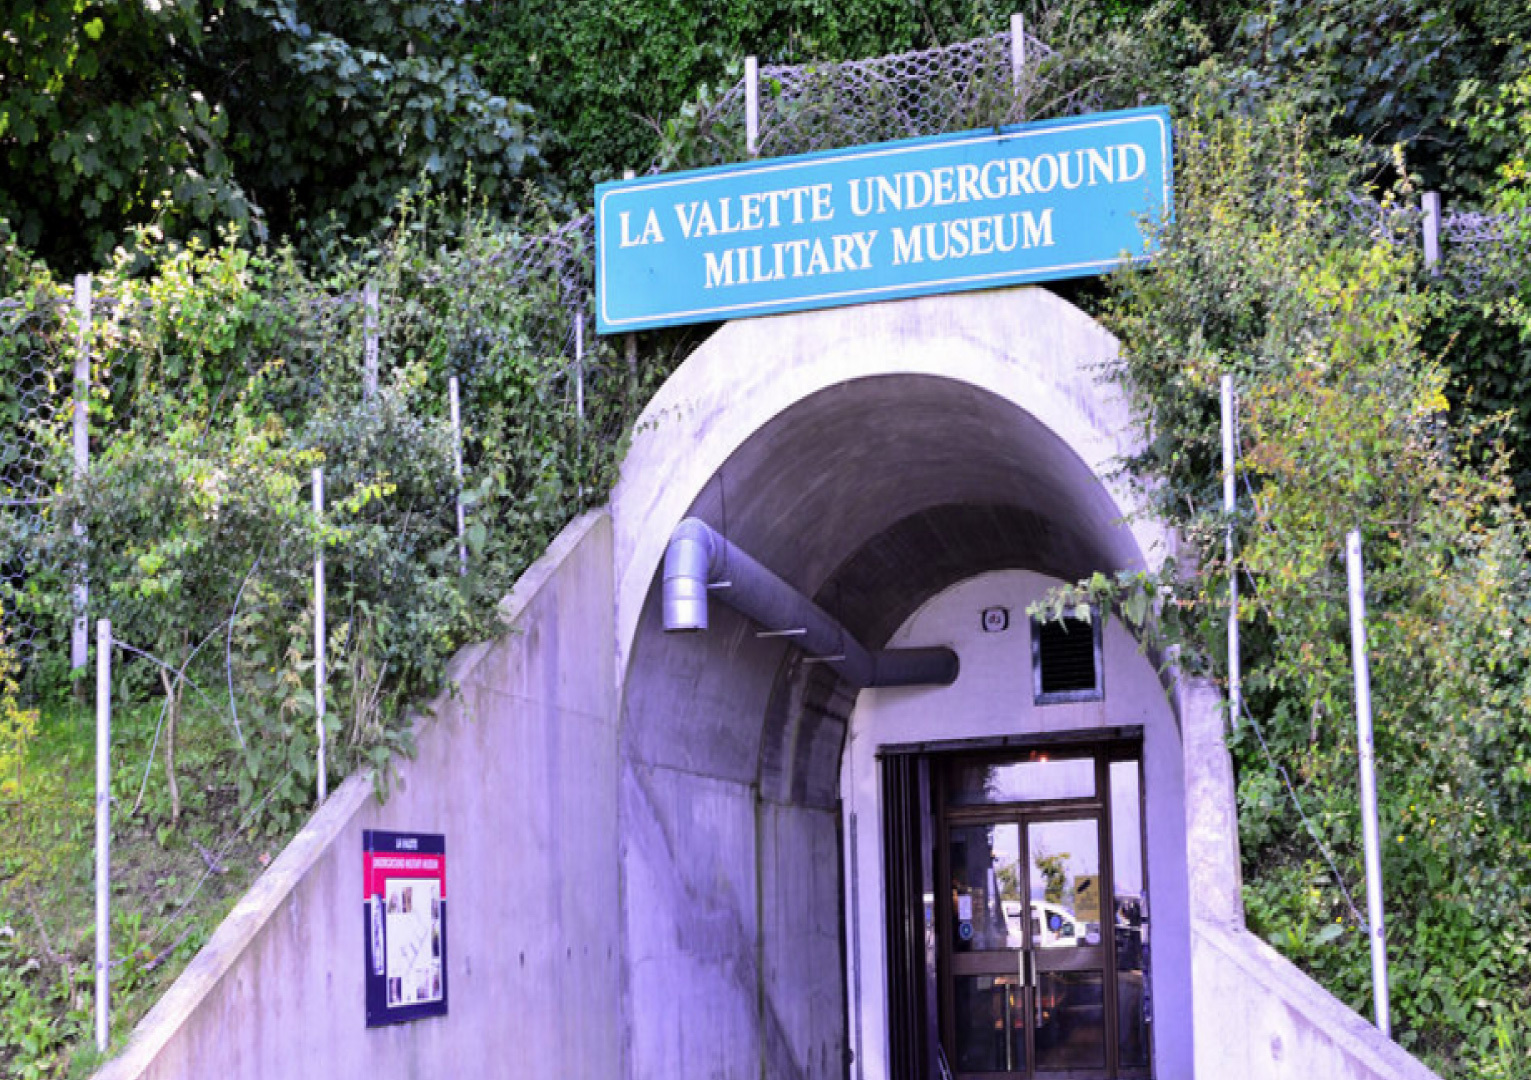 La Vallette Underground Military Museum